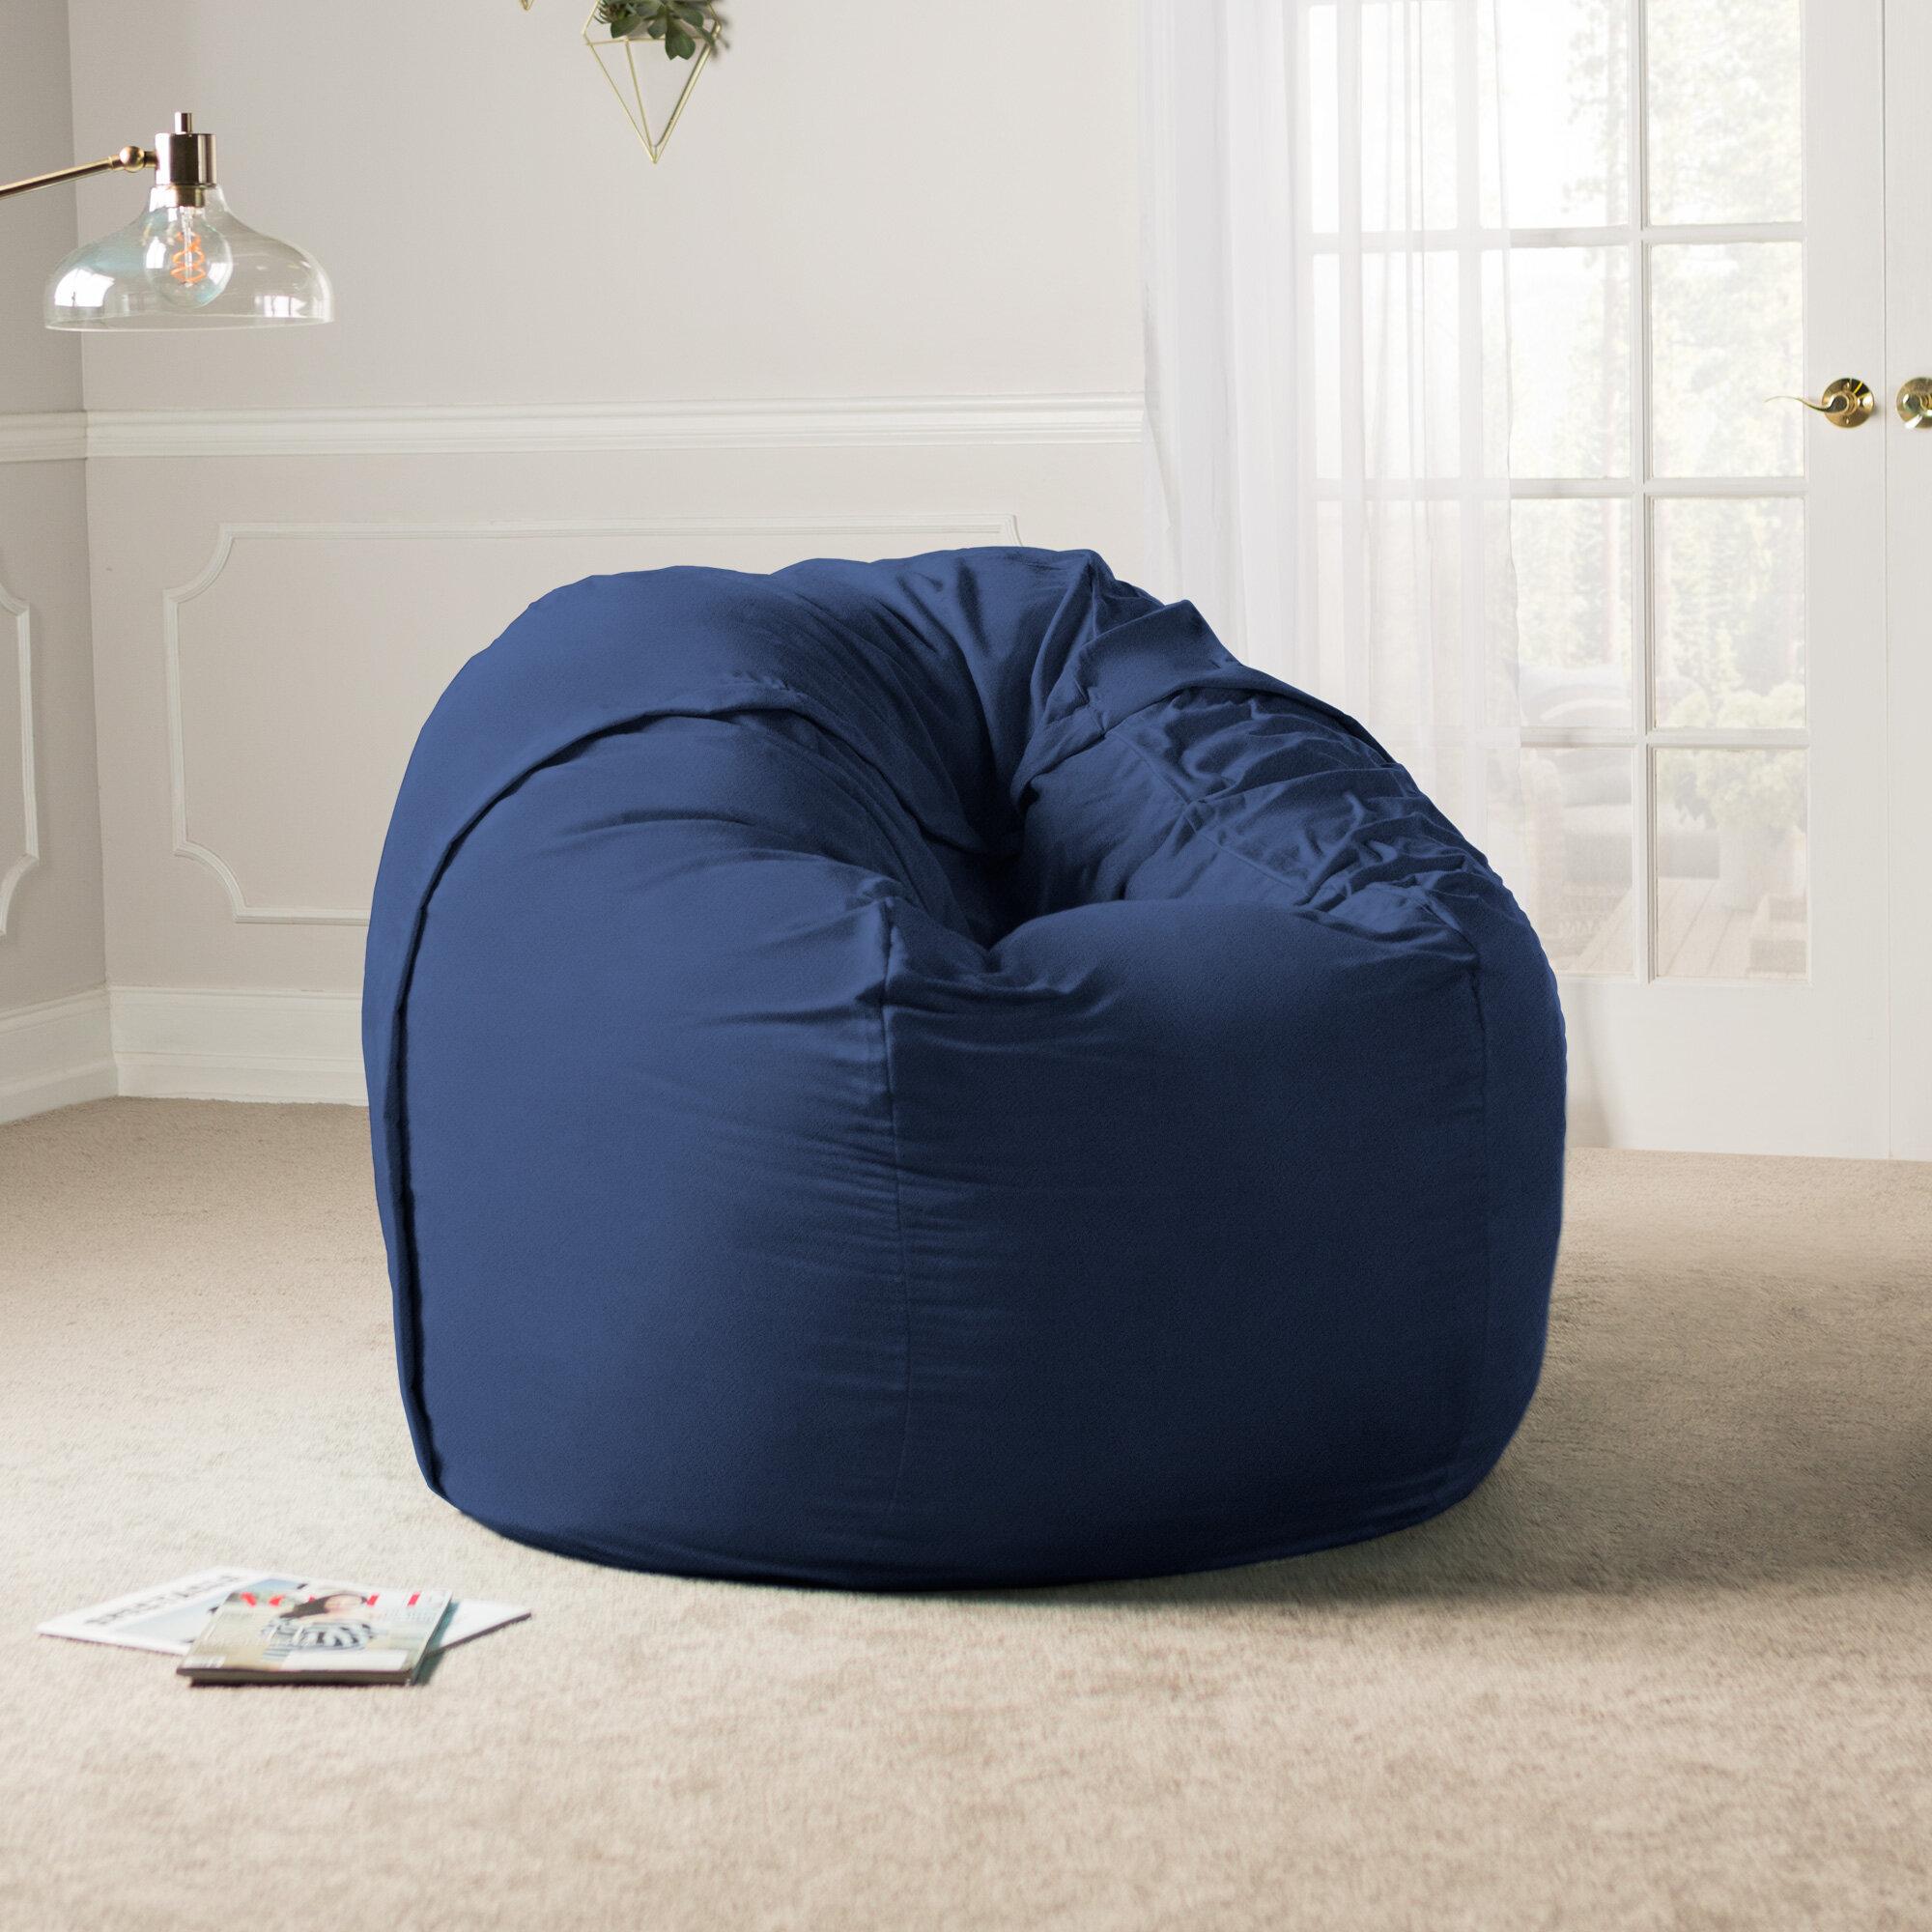 Latitude Run Giant Bean Bag Chair & Reviews | Wayfair.ca